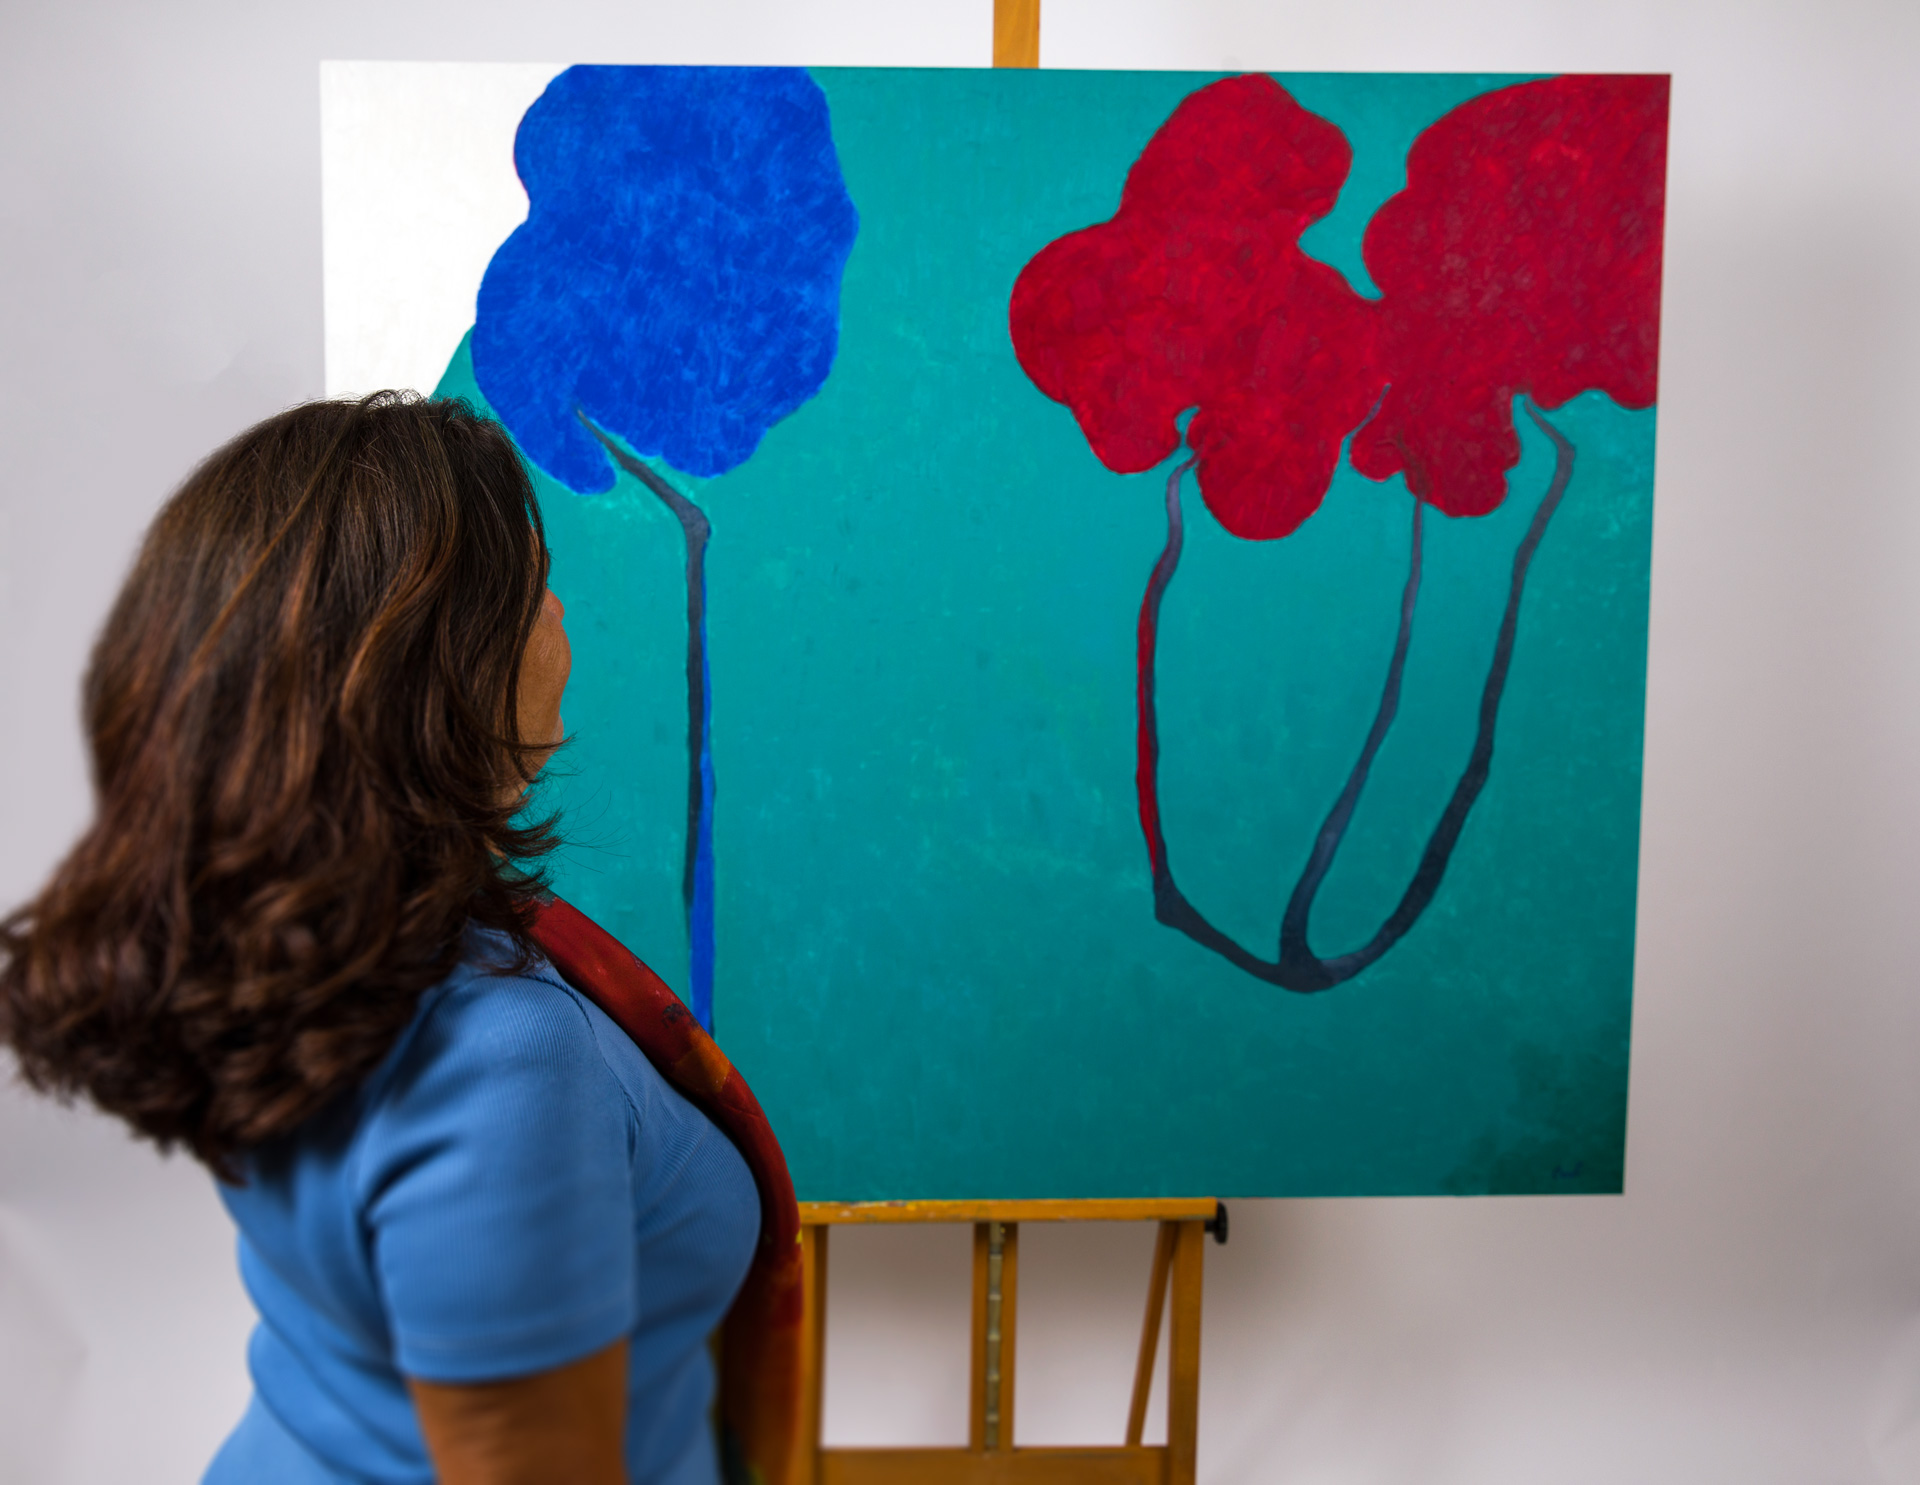 Maryse Casol, peinture Ceci N'est Pas Un Arbre VIII, 2011